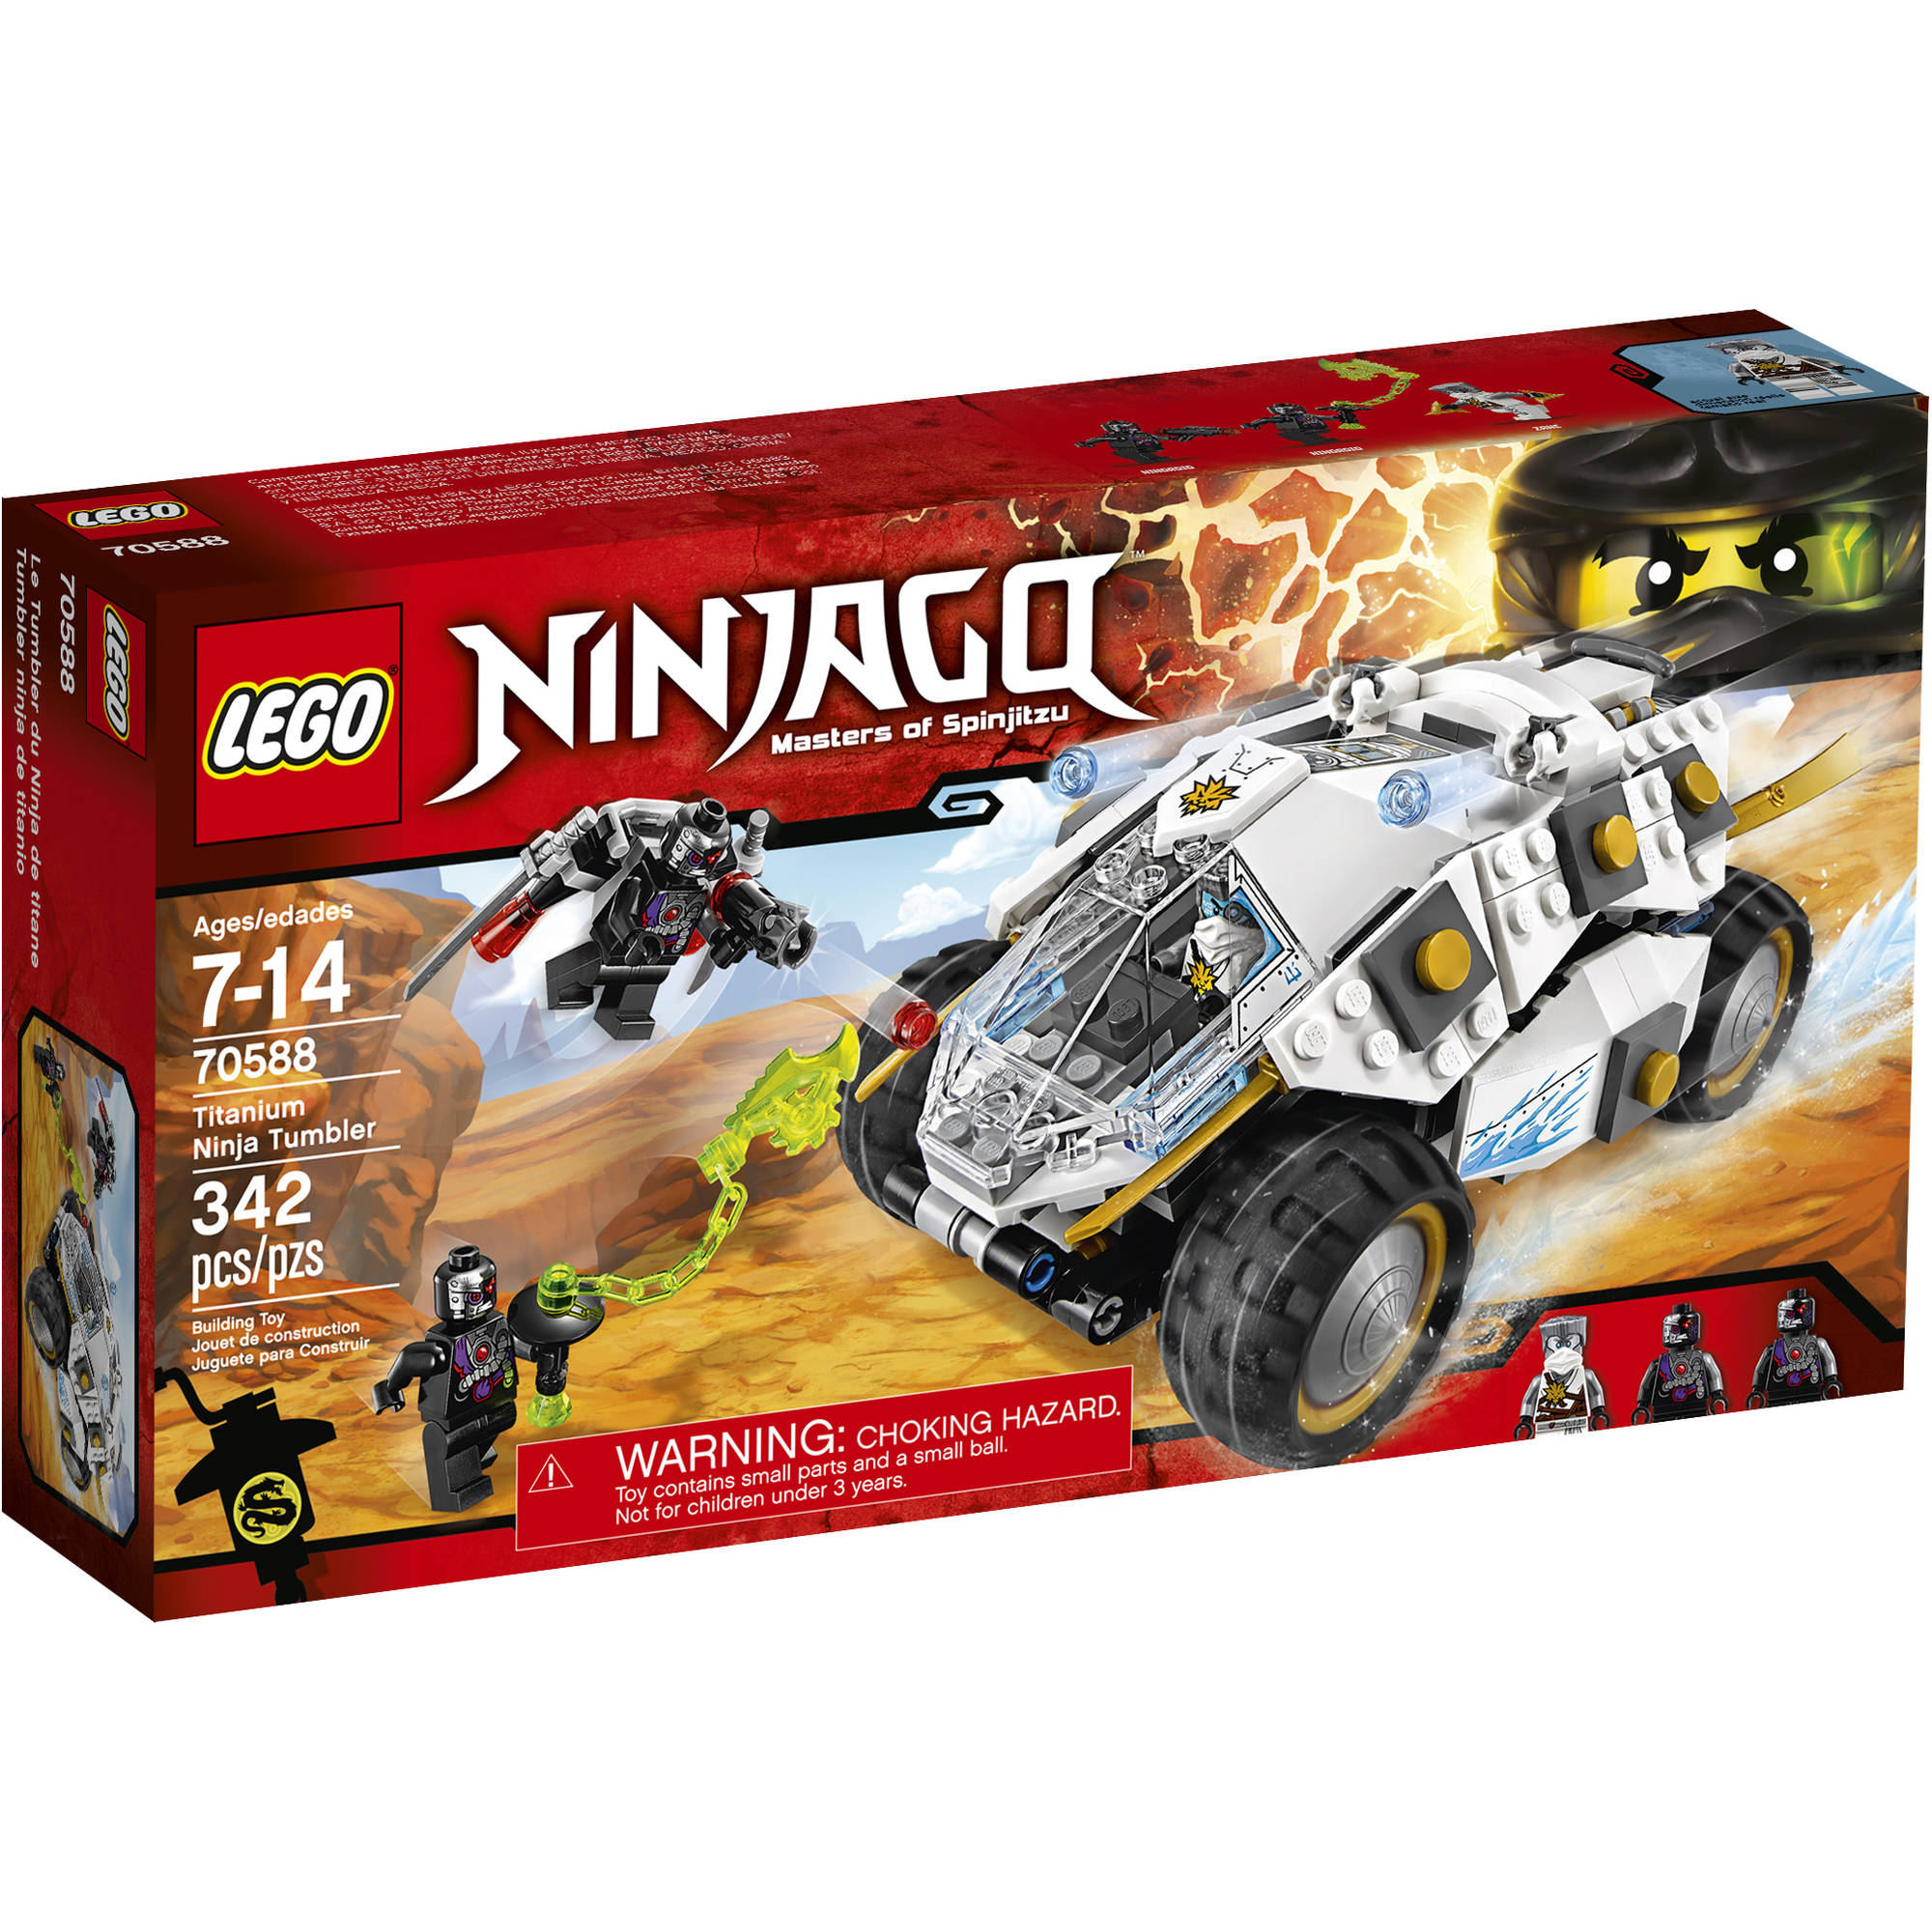 LEGO NINJAGO Titanium Ninja Tumbler 70588 - Walmart.com